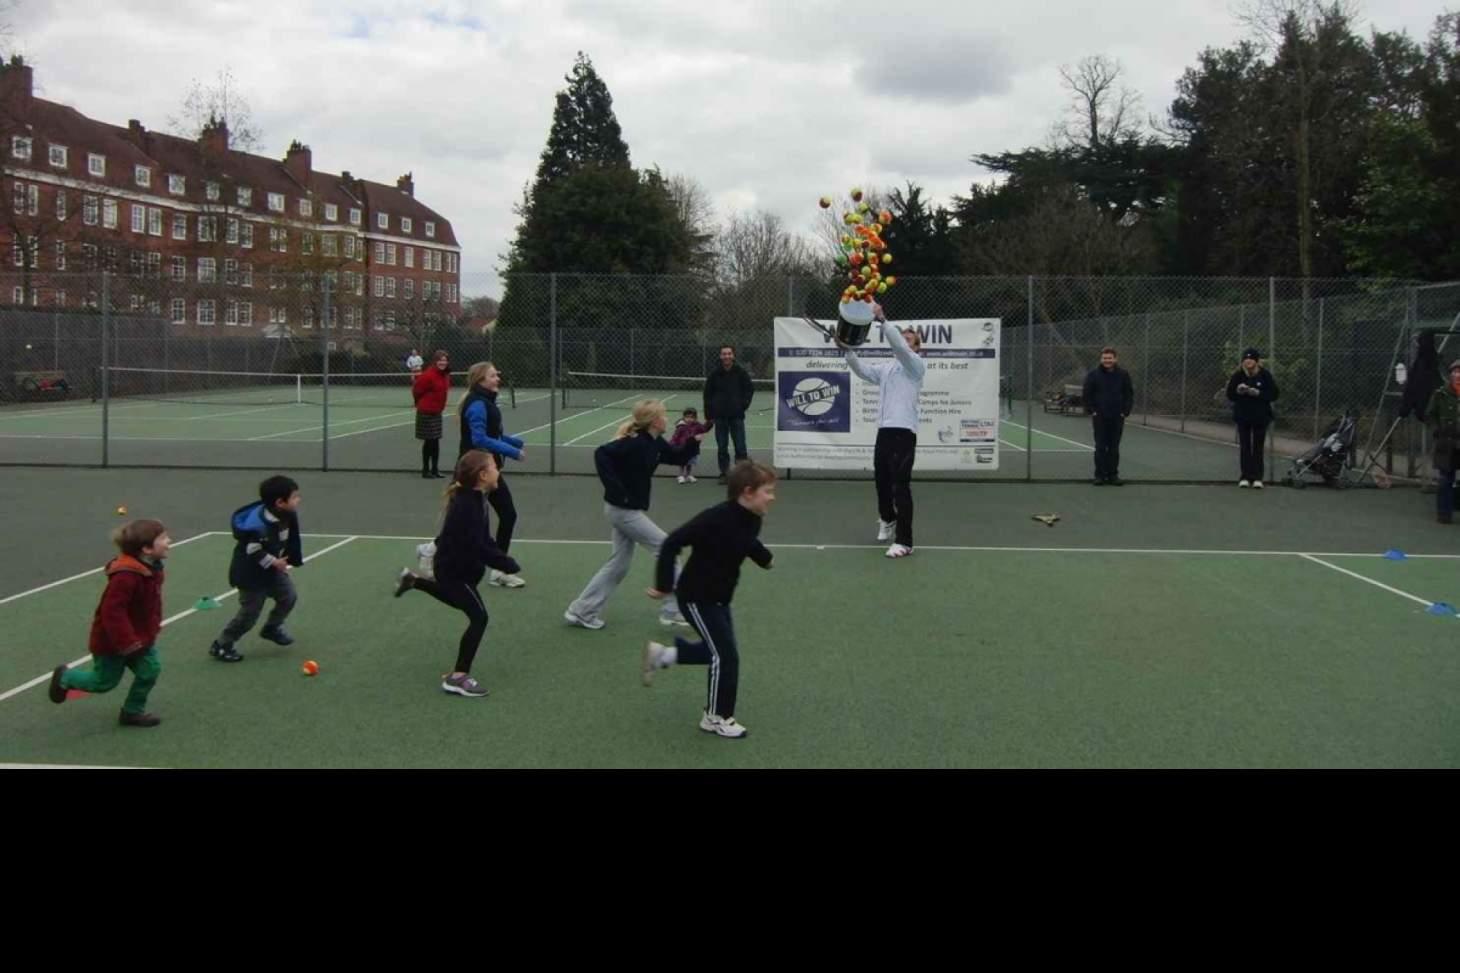 York House Gardens Outdoor | Hard (macadam) tennis court